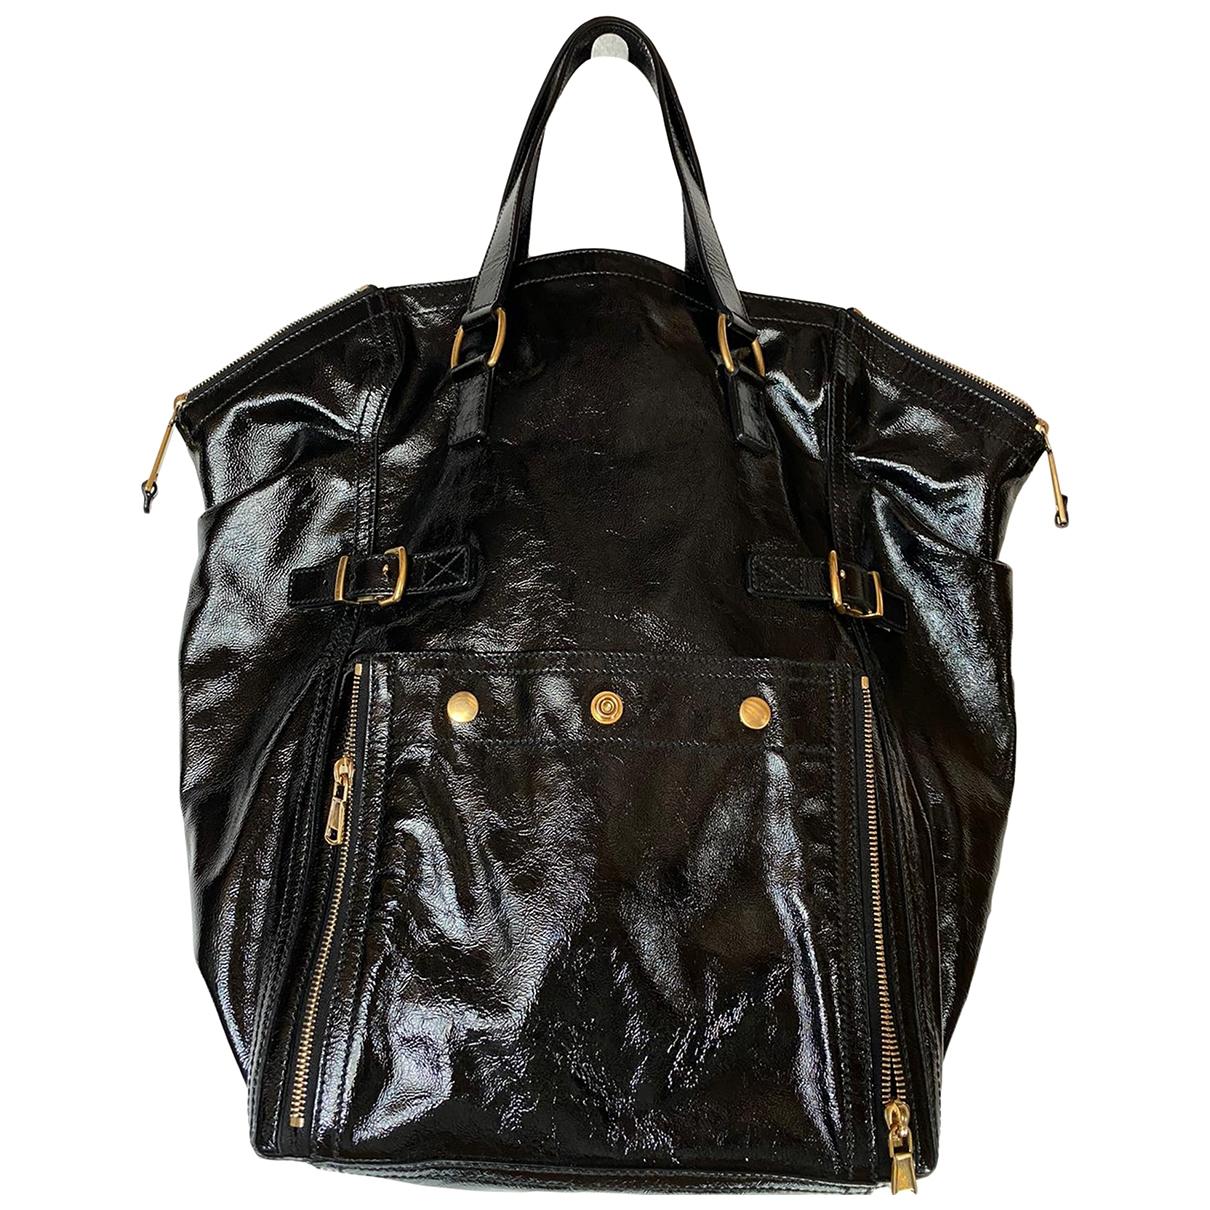 Yves Saint Laurent Downtown Black Patent leather handbag for Women \N